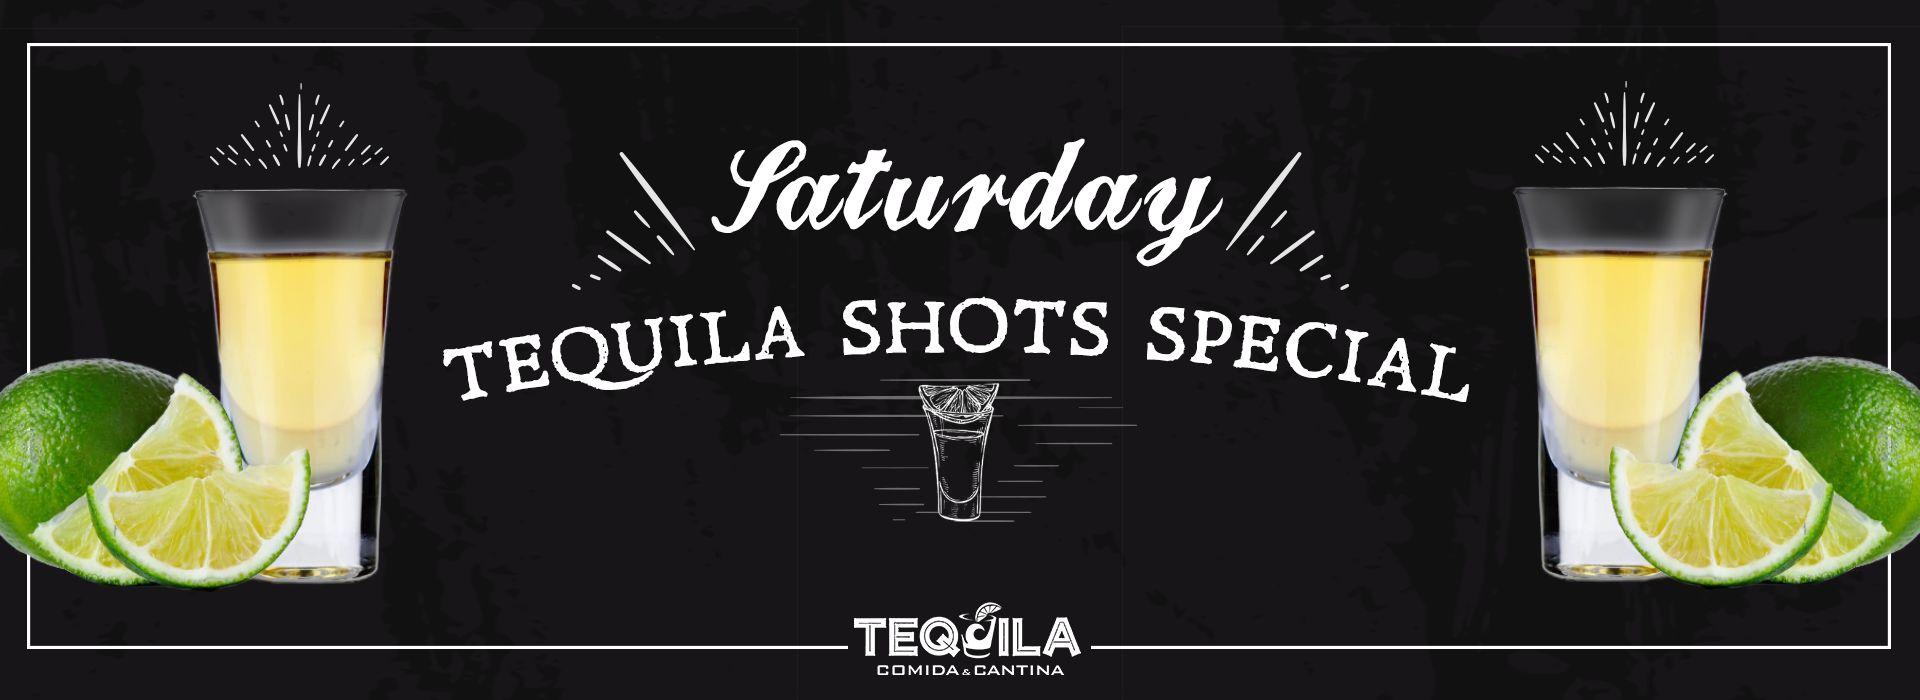 TEQUILA DRINKS BANNER 1920X700 NOV 07